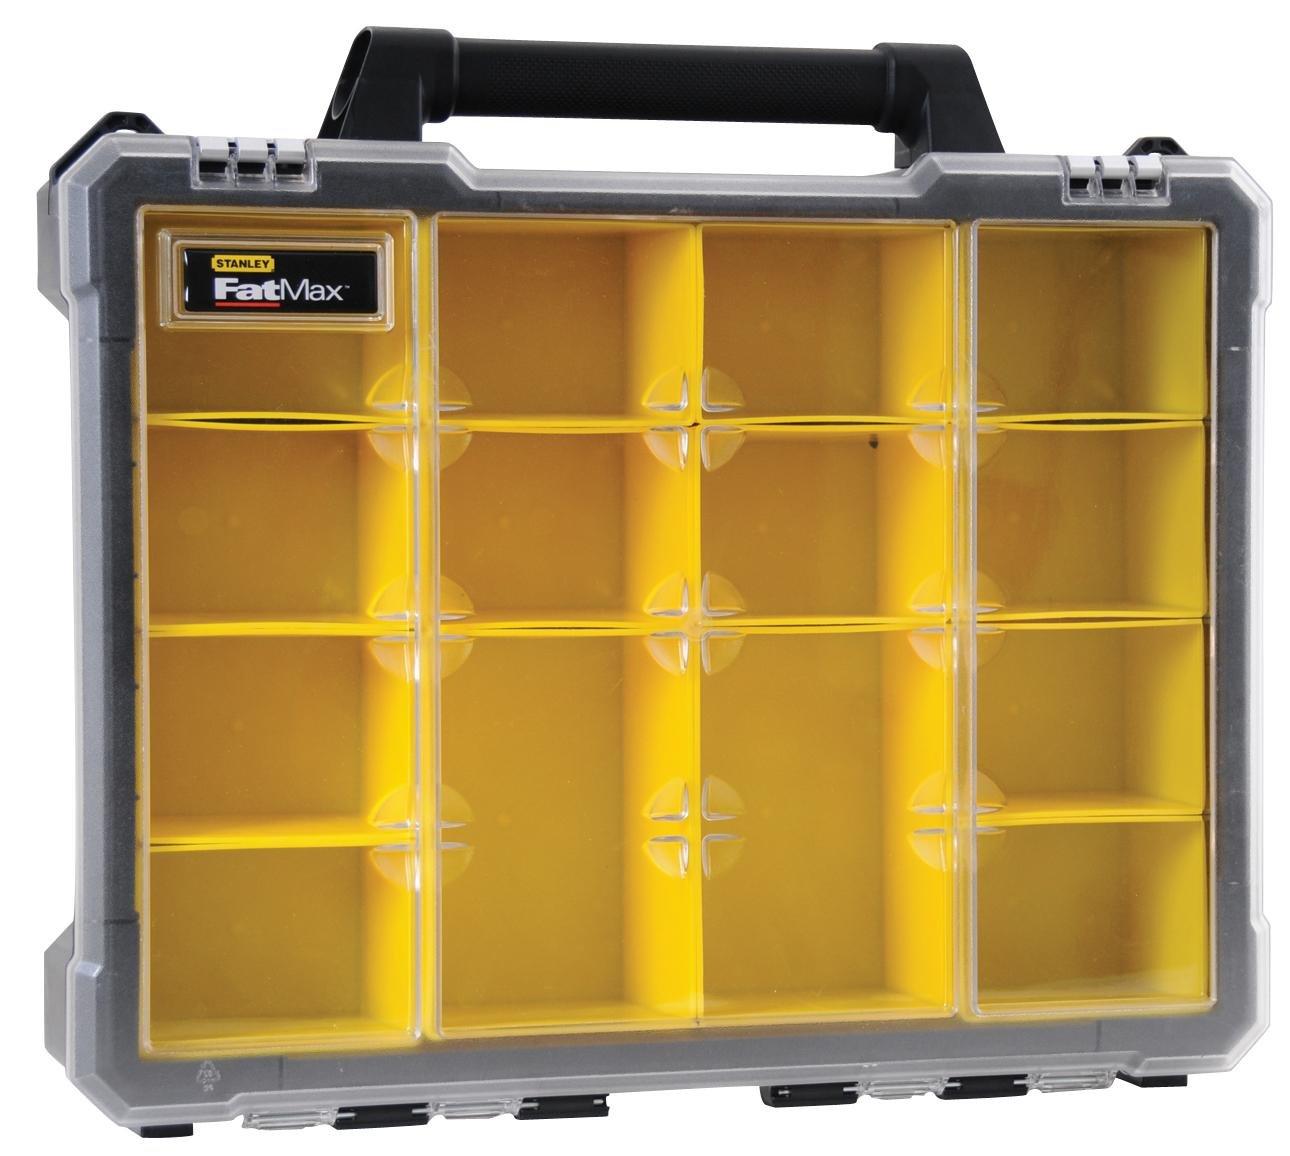 Stanley 014461M Fatmax Large Organizer Professional: Tool Cabinets:  Amazon.com: Industrial U0026 Scientific